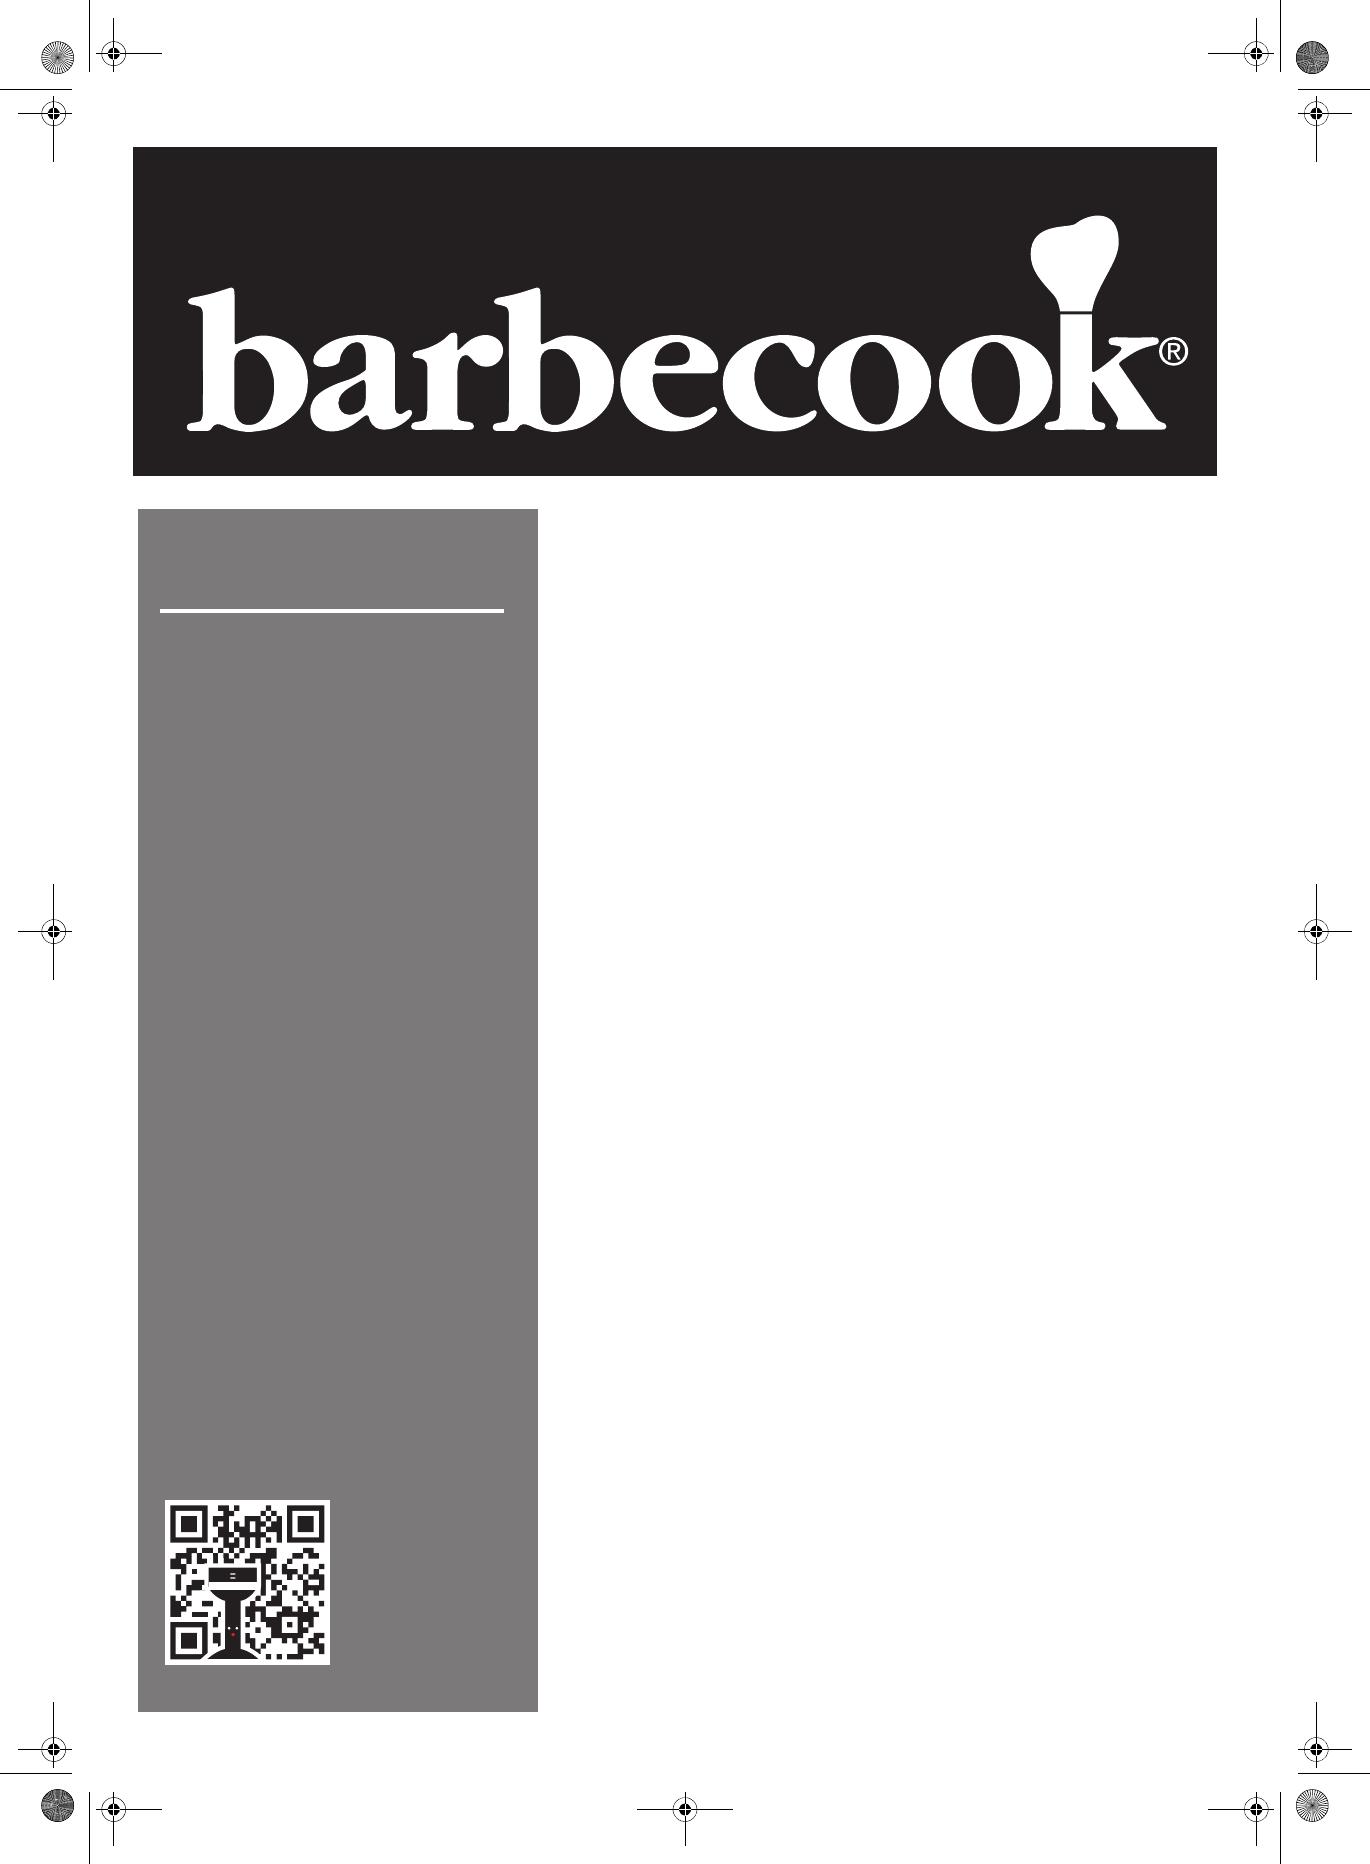 Barbecook 3-in-1 Long Brush SAEY HOME /& GARDEN N.V